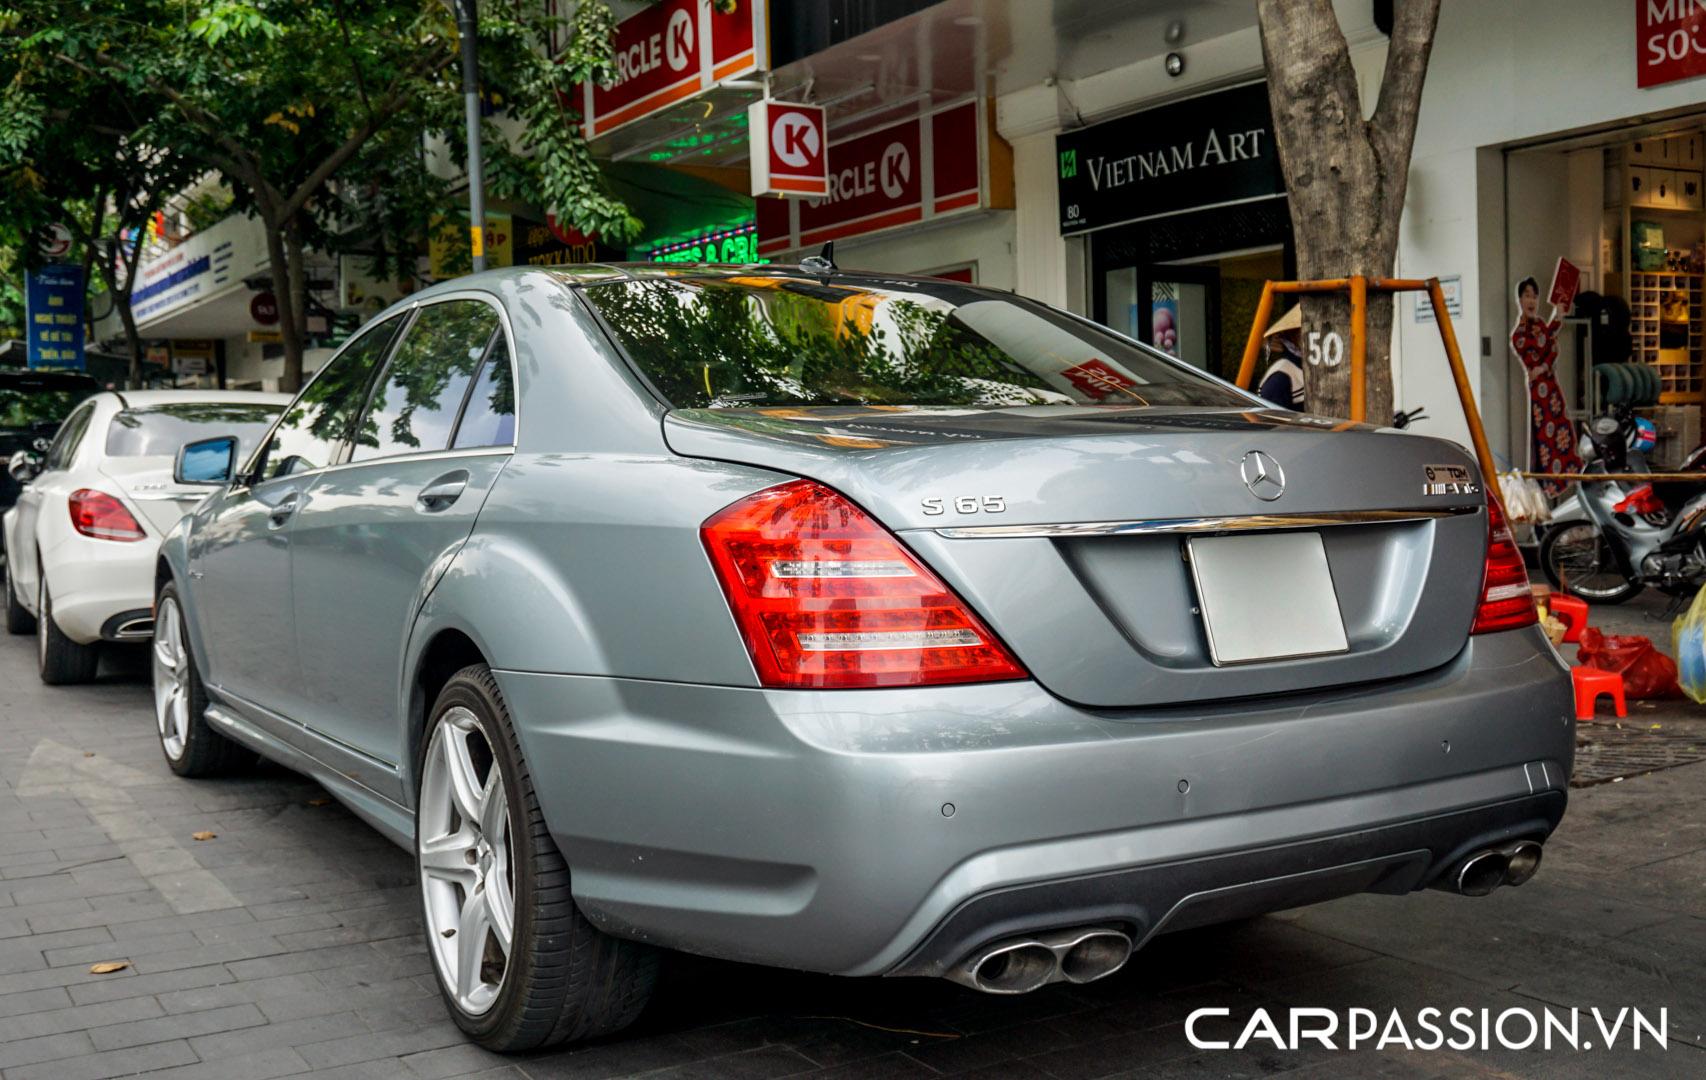 CP-Mercedes-Benz S65 AMG (19).jpg